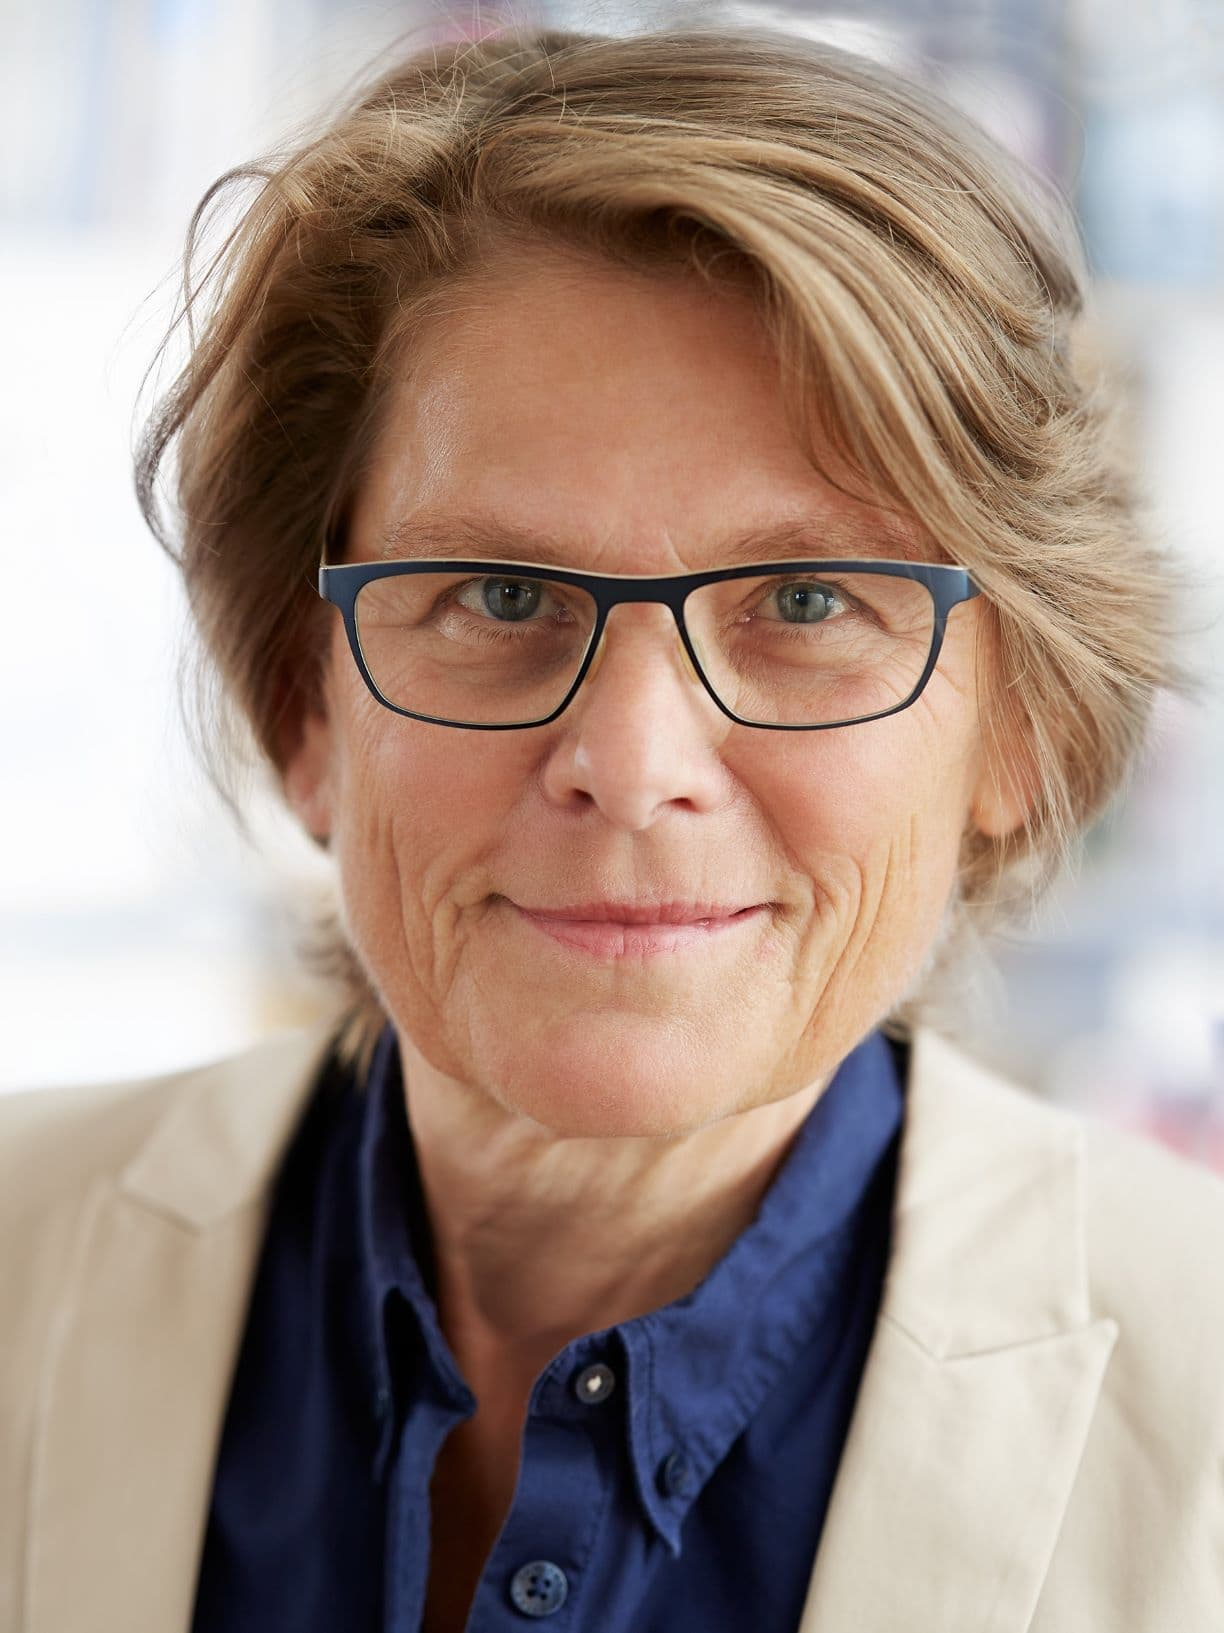 Maria Leenen, Chefin der Unternehmensberatung SCI